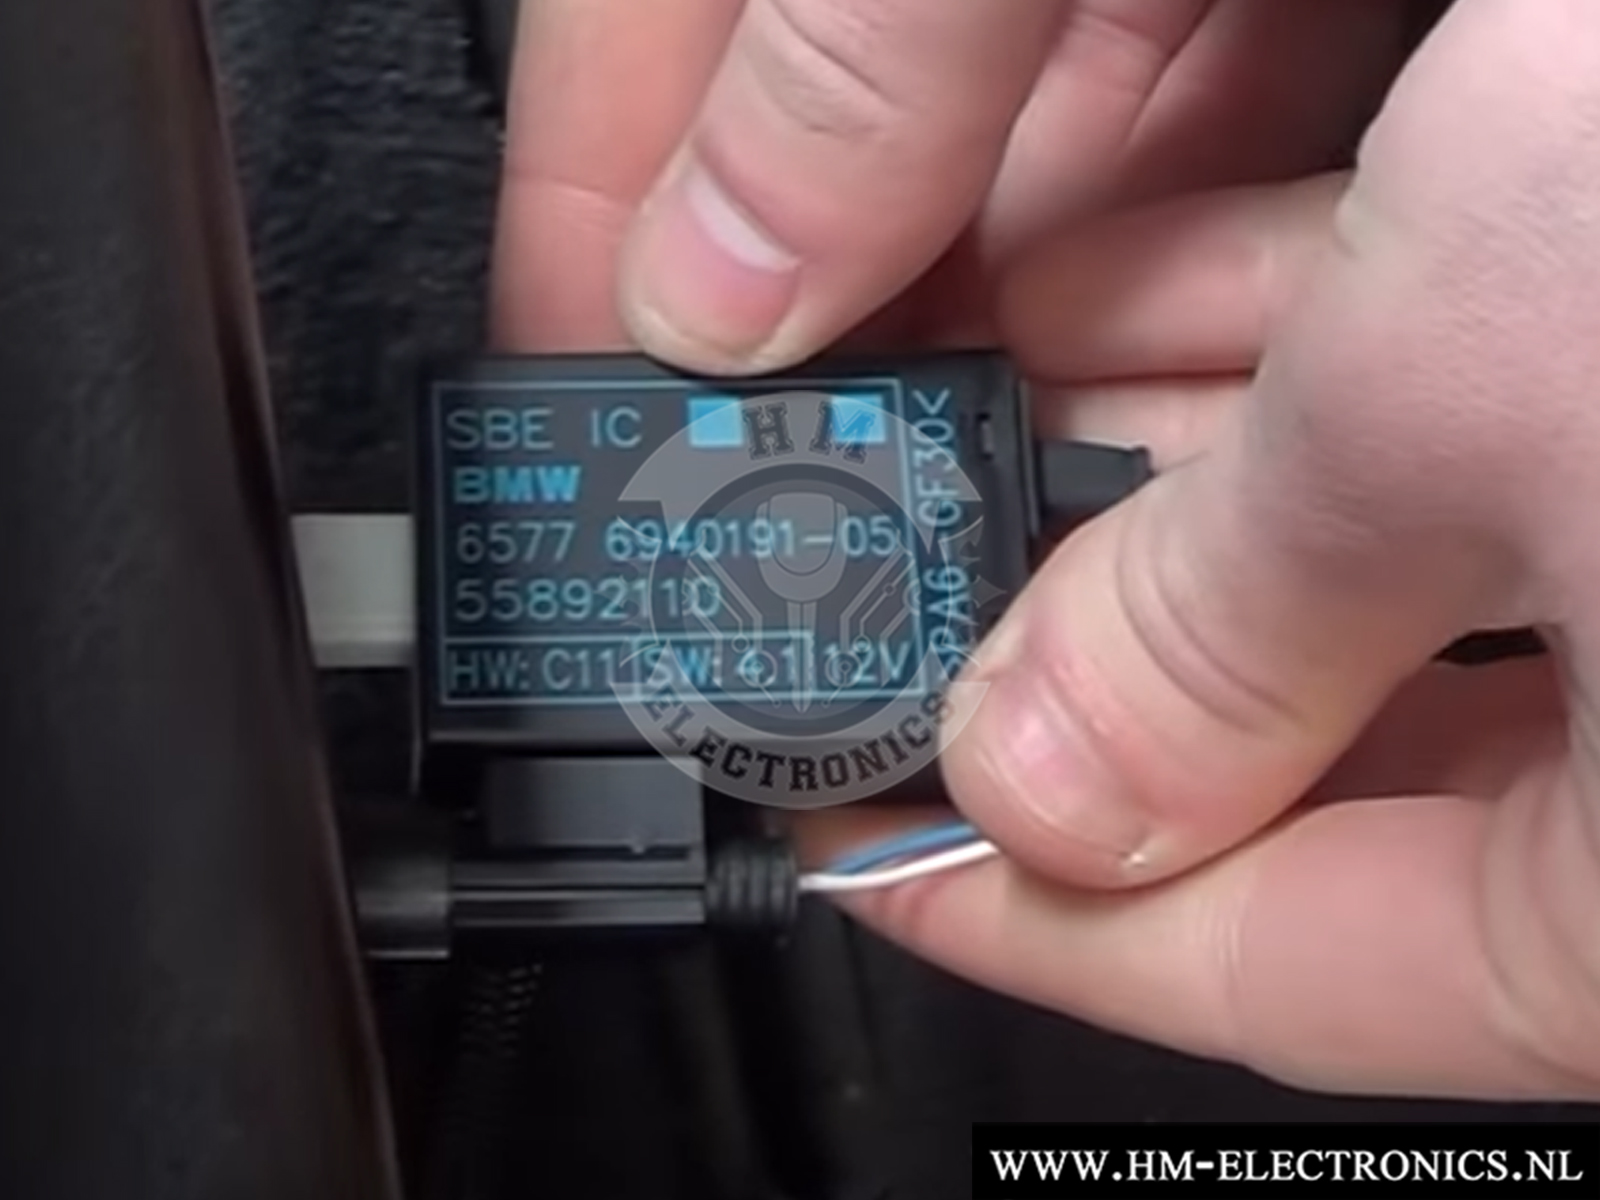 Image titleBMW E32, E34, E36, E38, E39, E46, E53, E60, E61, E65 Diagnostische Passagiersstoel Mat Sensor / Emulator